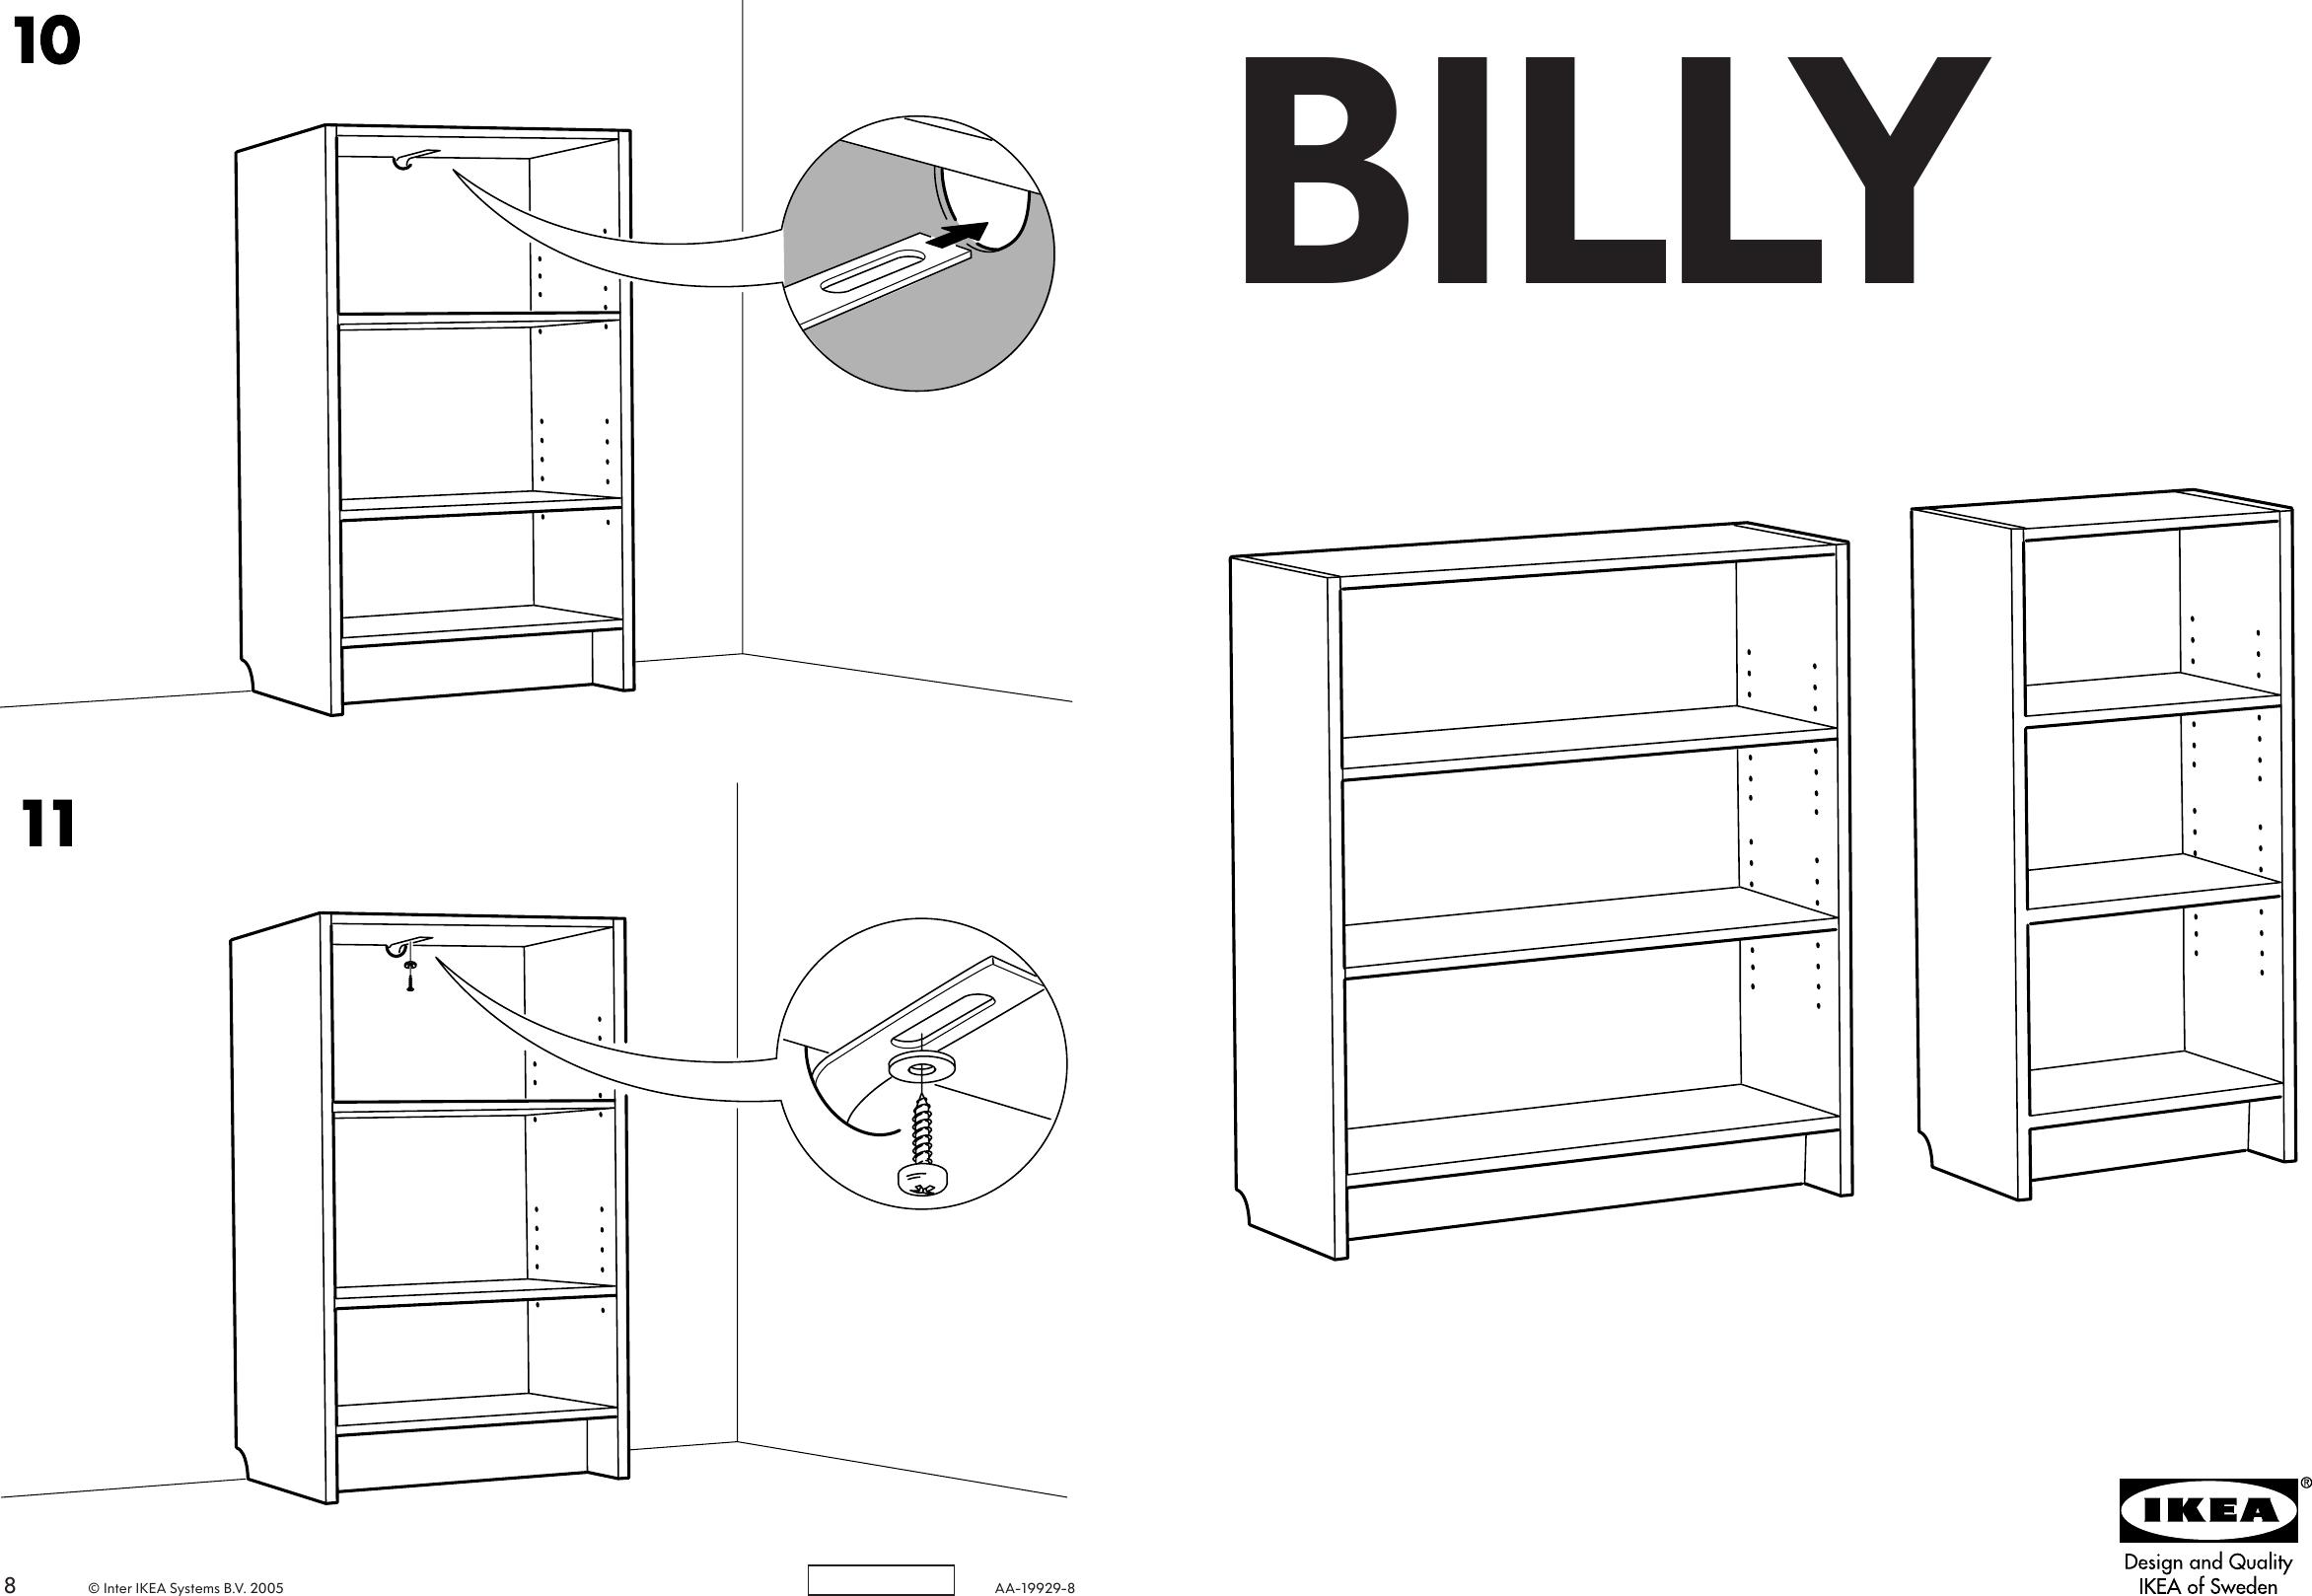 Ikea Billy Bookcase 41 3 4 Tall Assembly Instruction